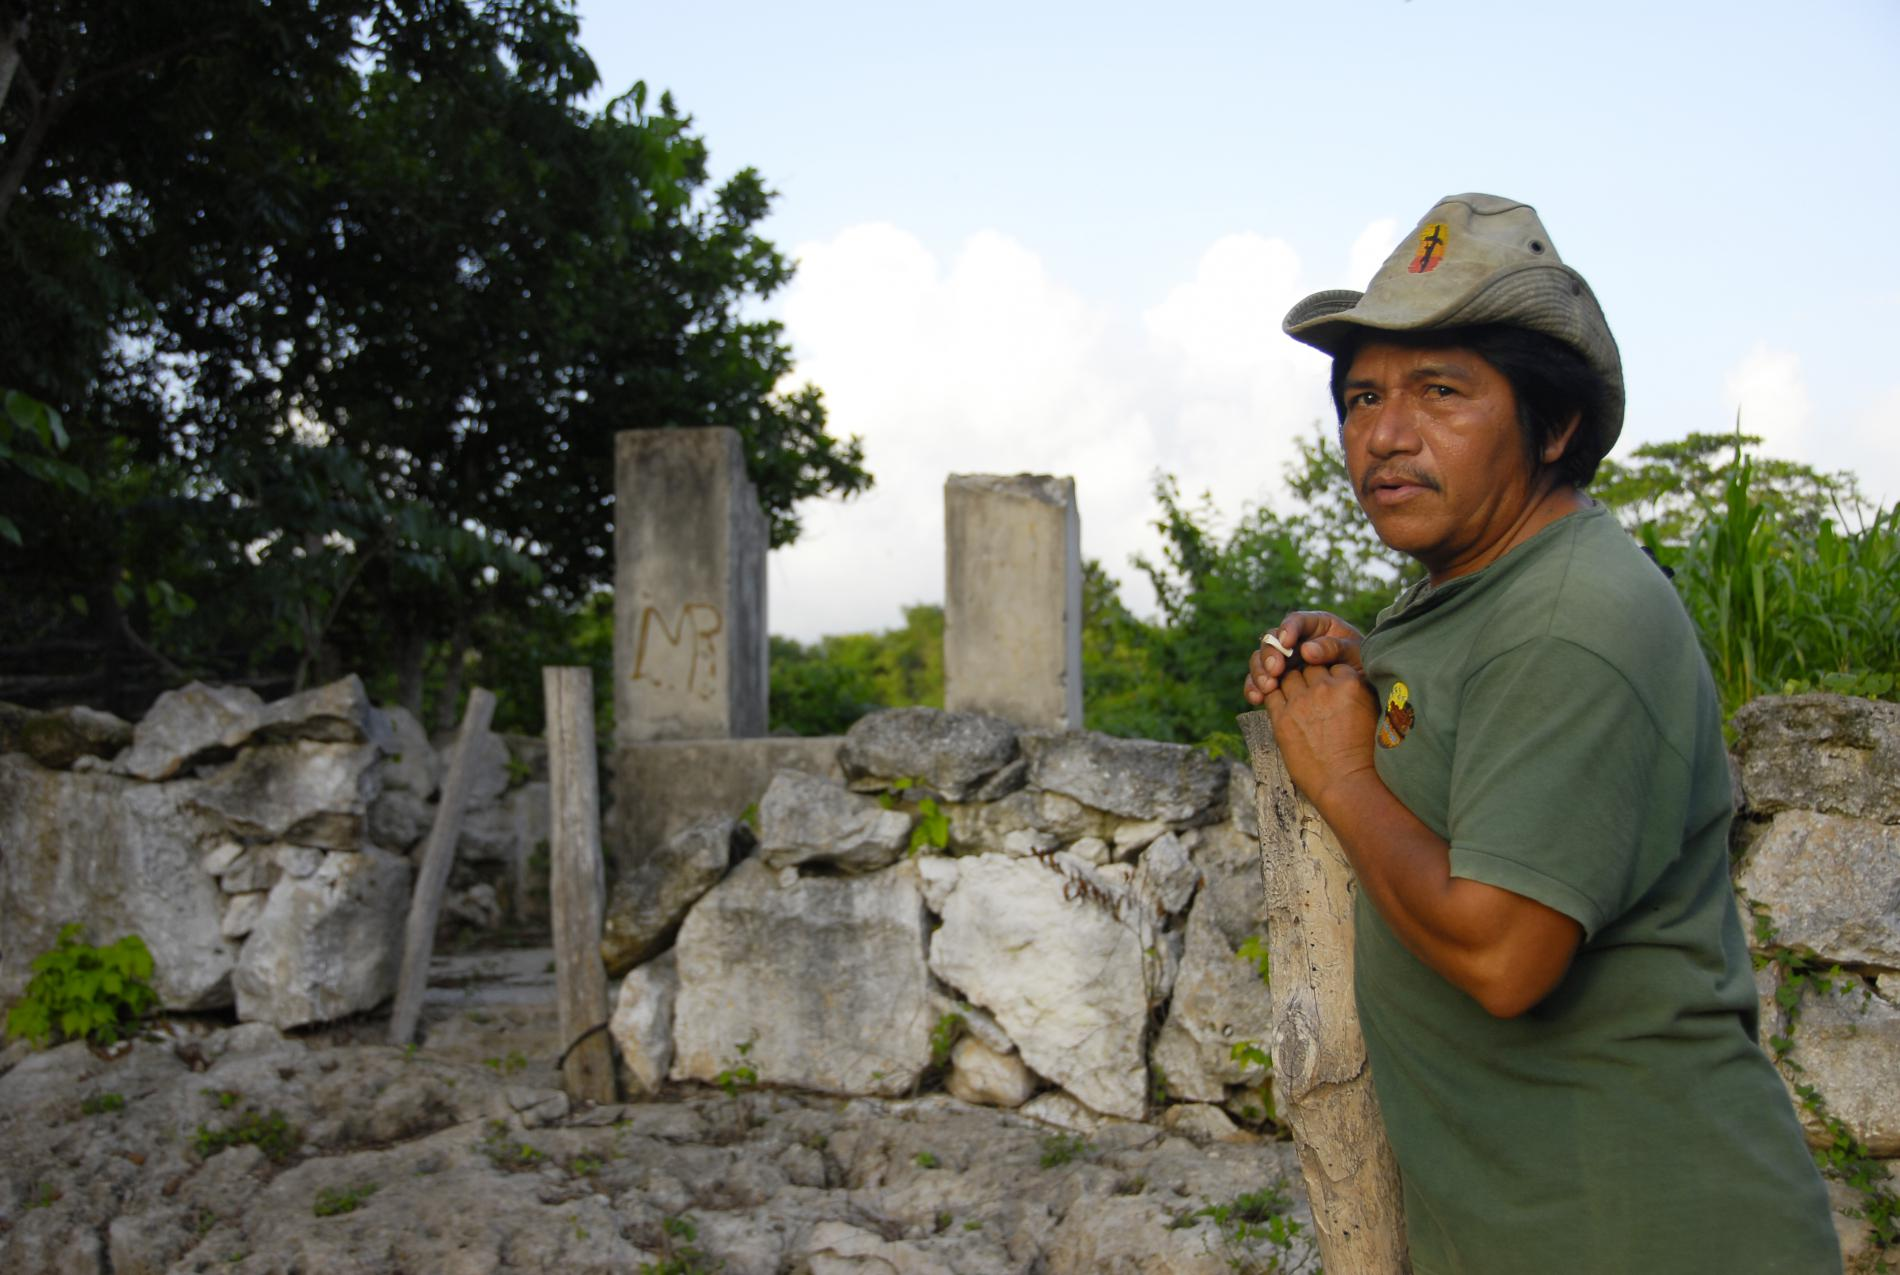 Voyage solidaire Mexique : Vision du Monde - Photo 8